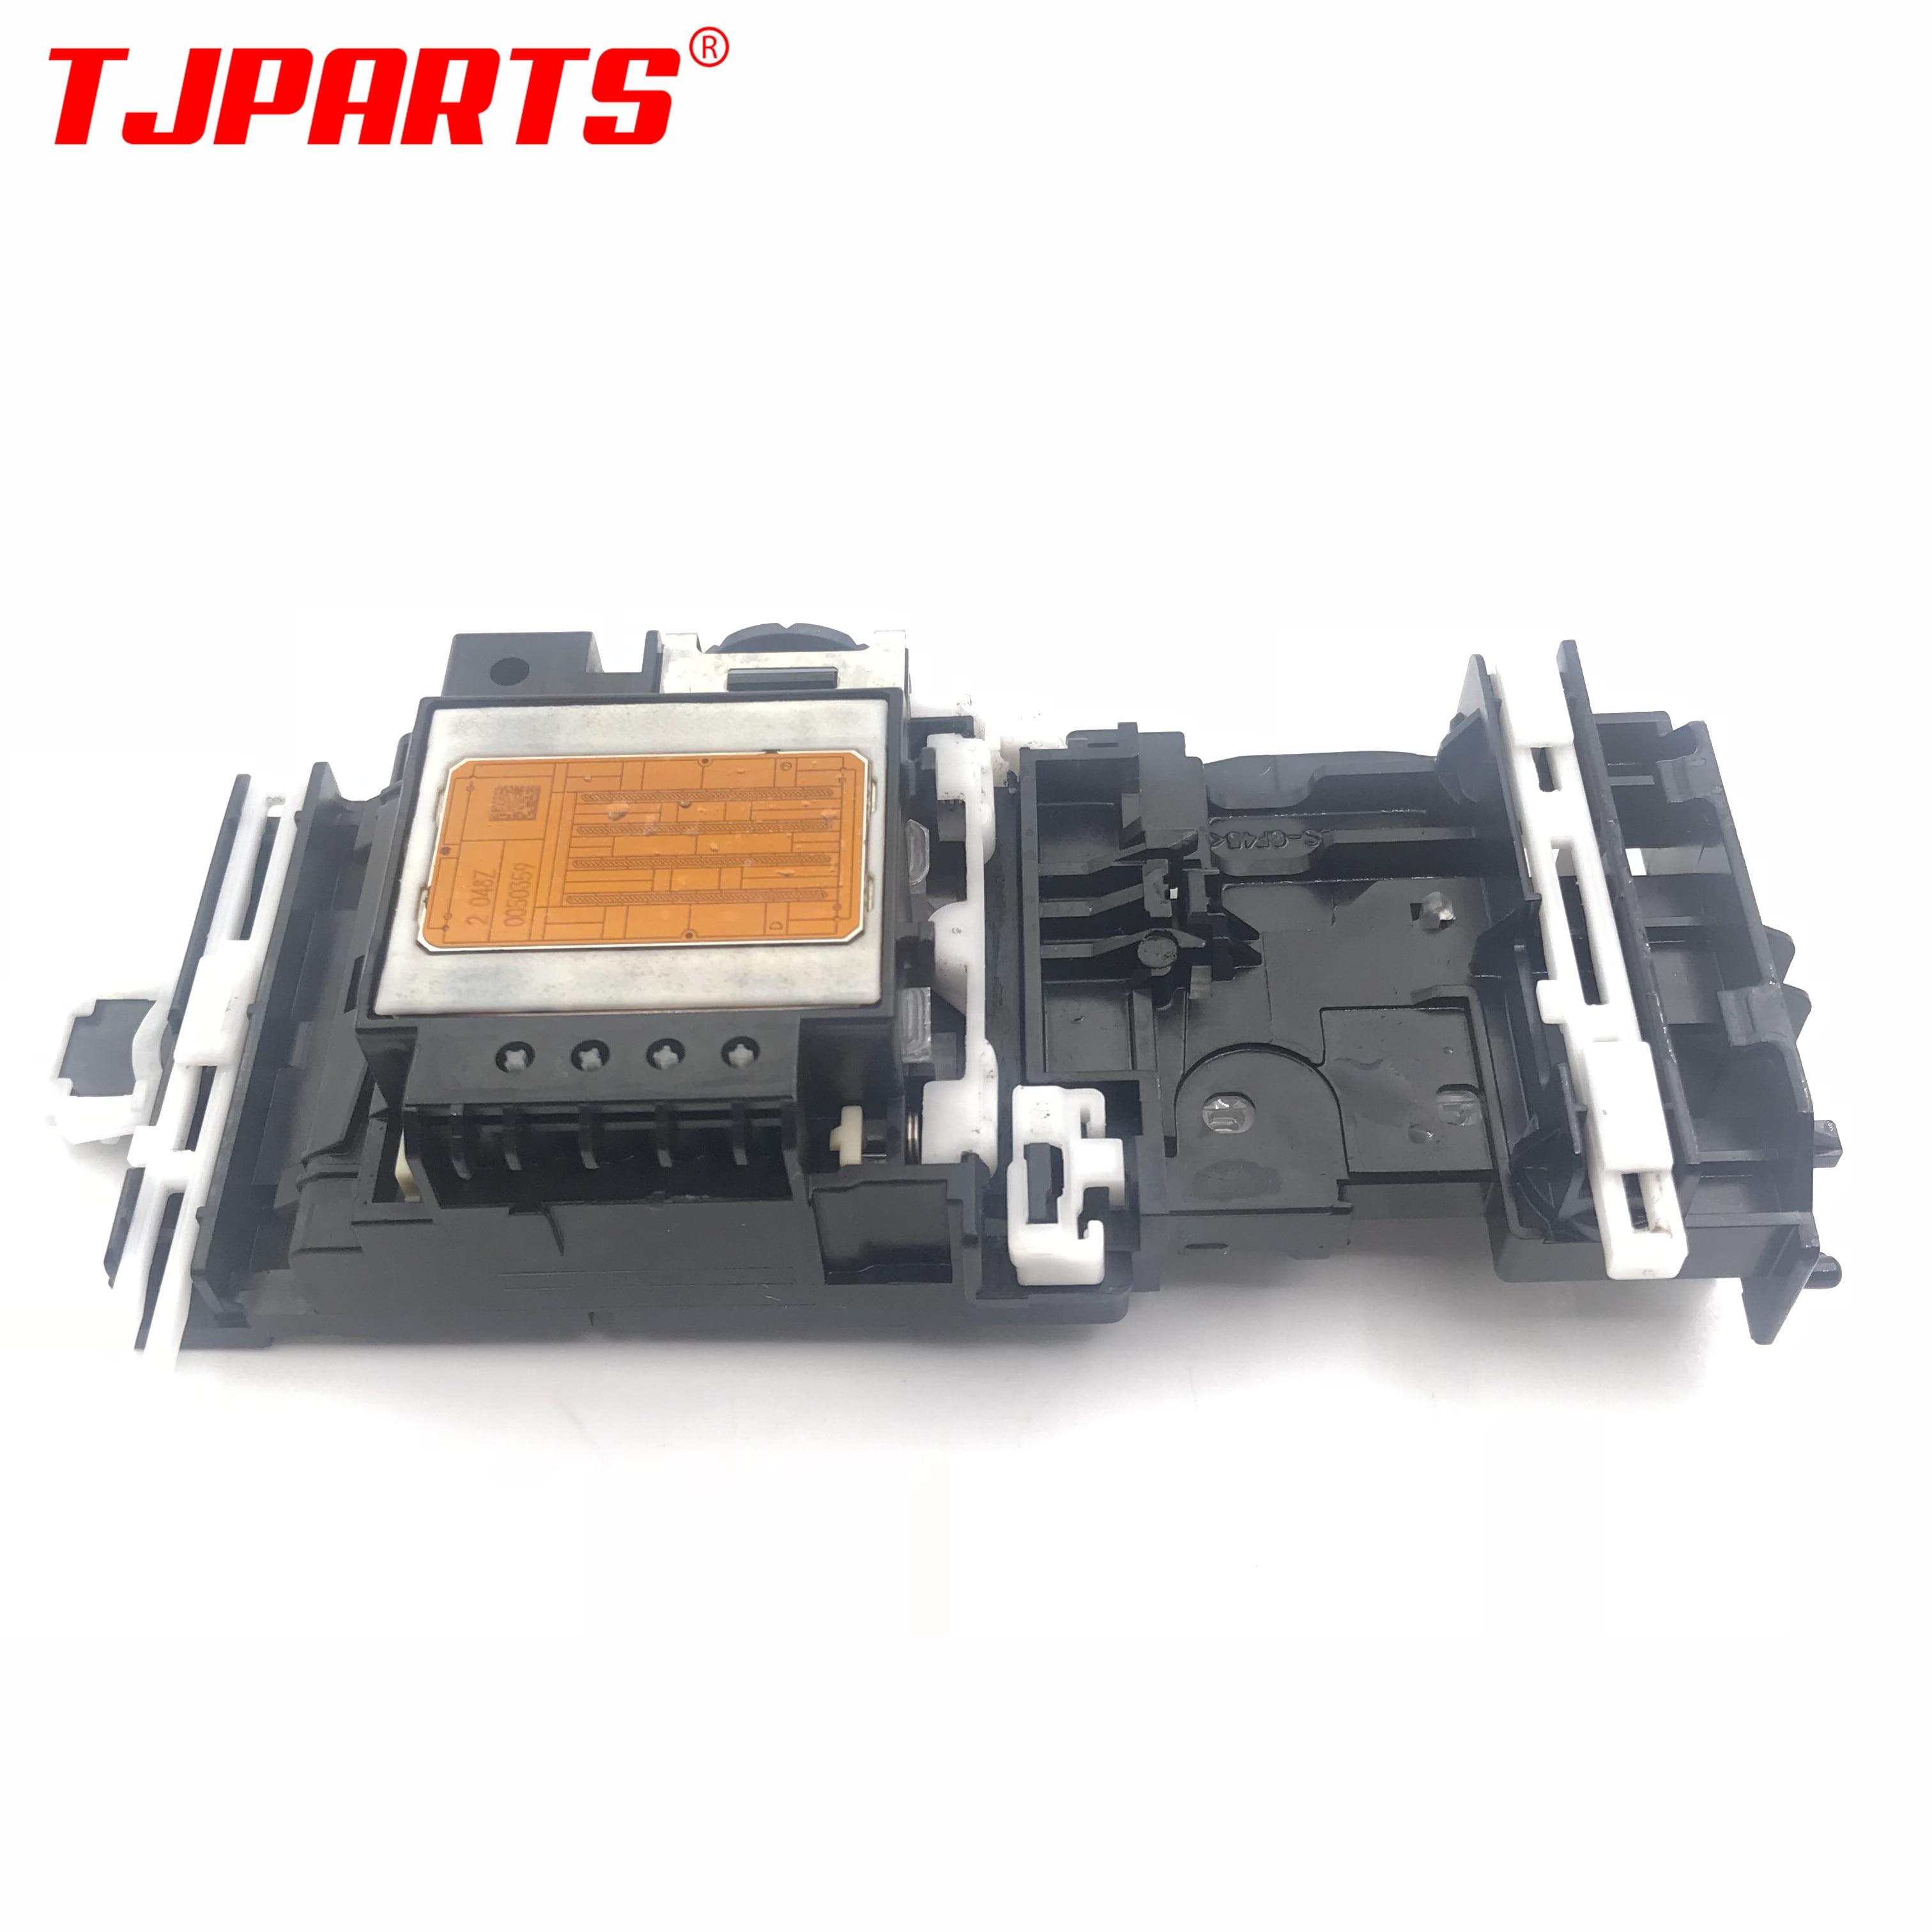 LK3211001 990 A4  Print Head for Brother 395C 250C 255C 290C 295C 490C dcp 395c